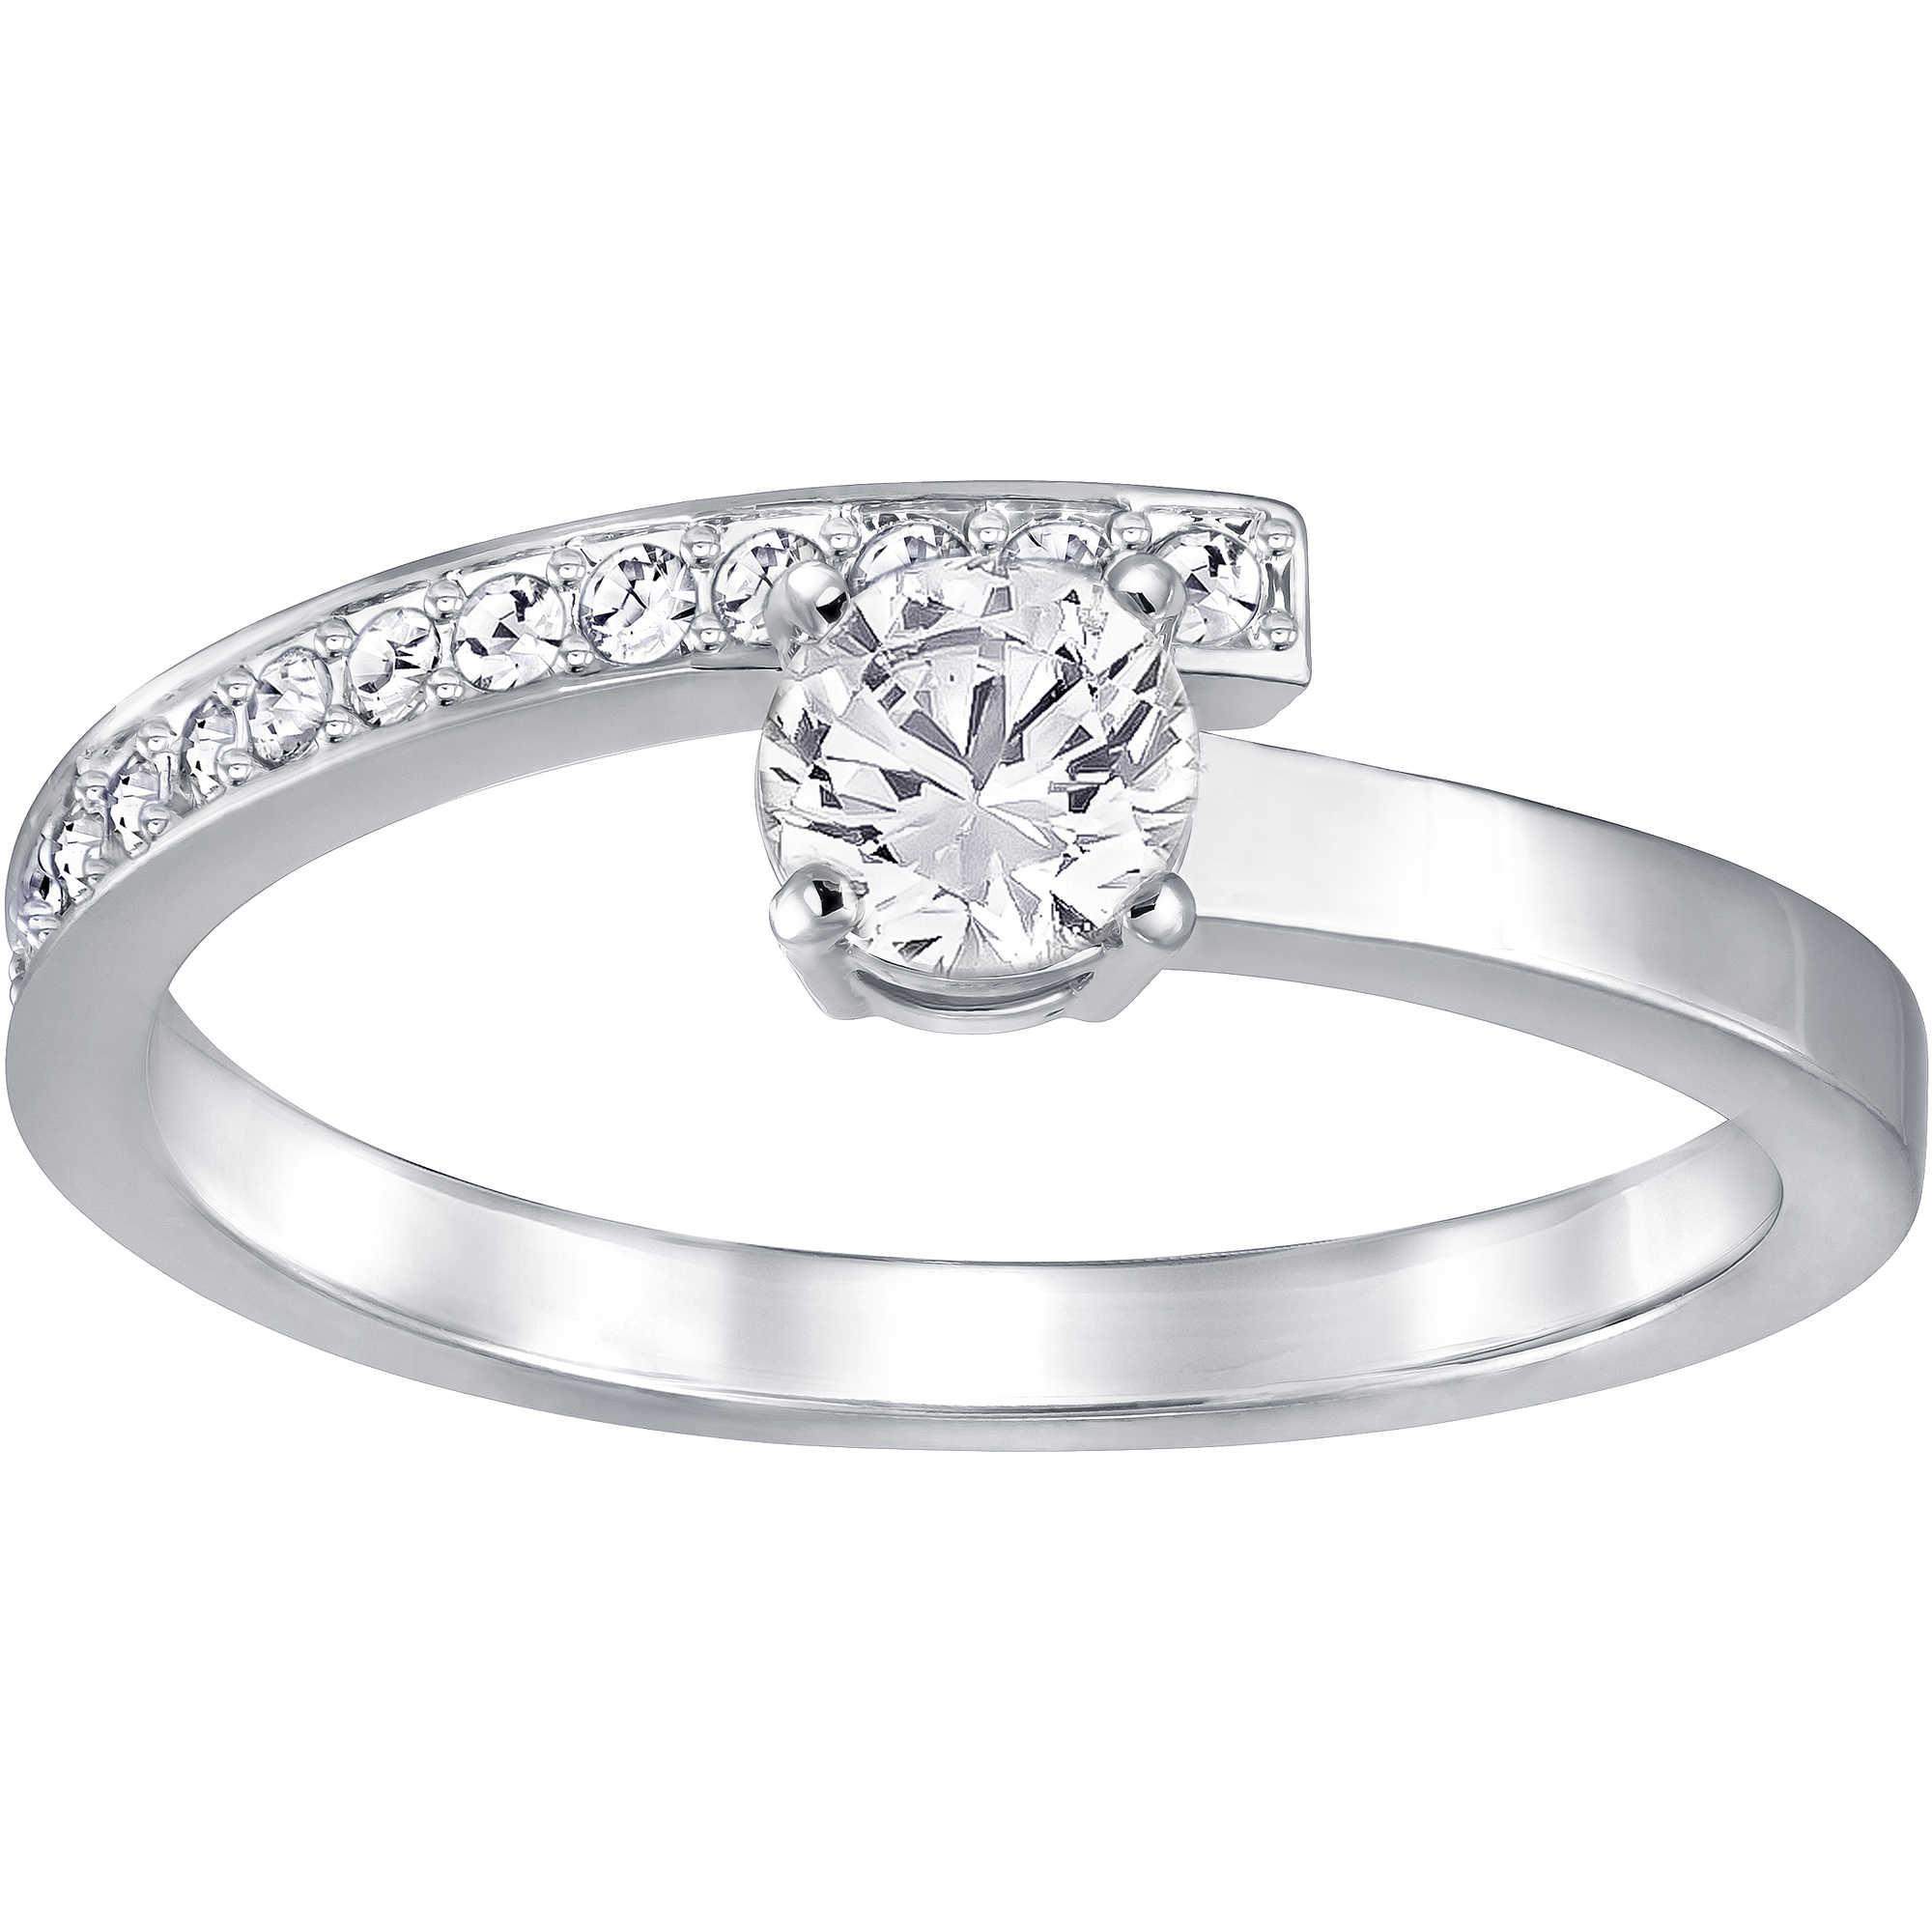 enorme sconto b18d1 75b93 anello donna gioielli Swarovski Fresh 5251686